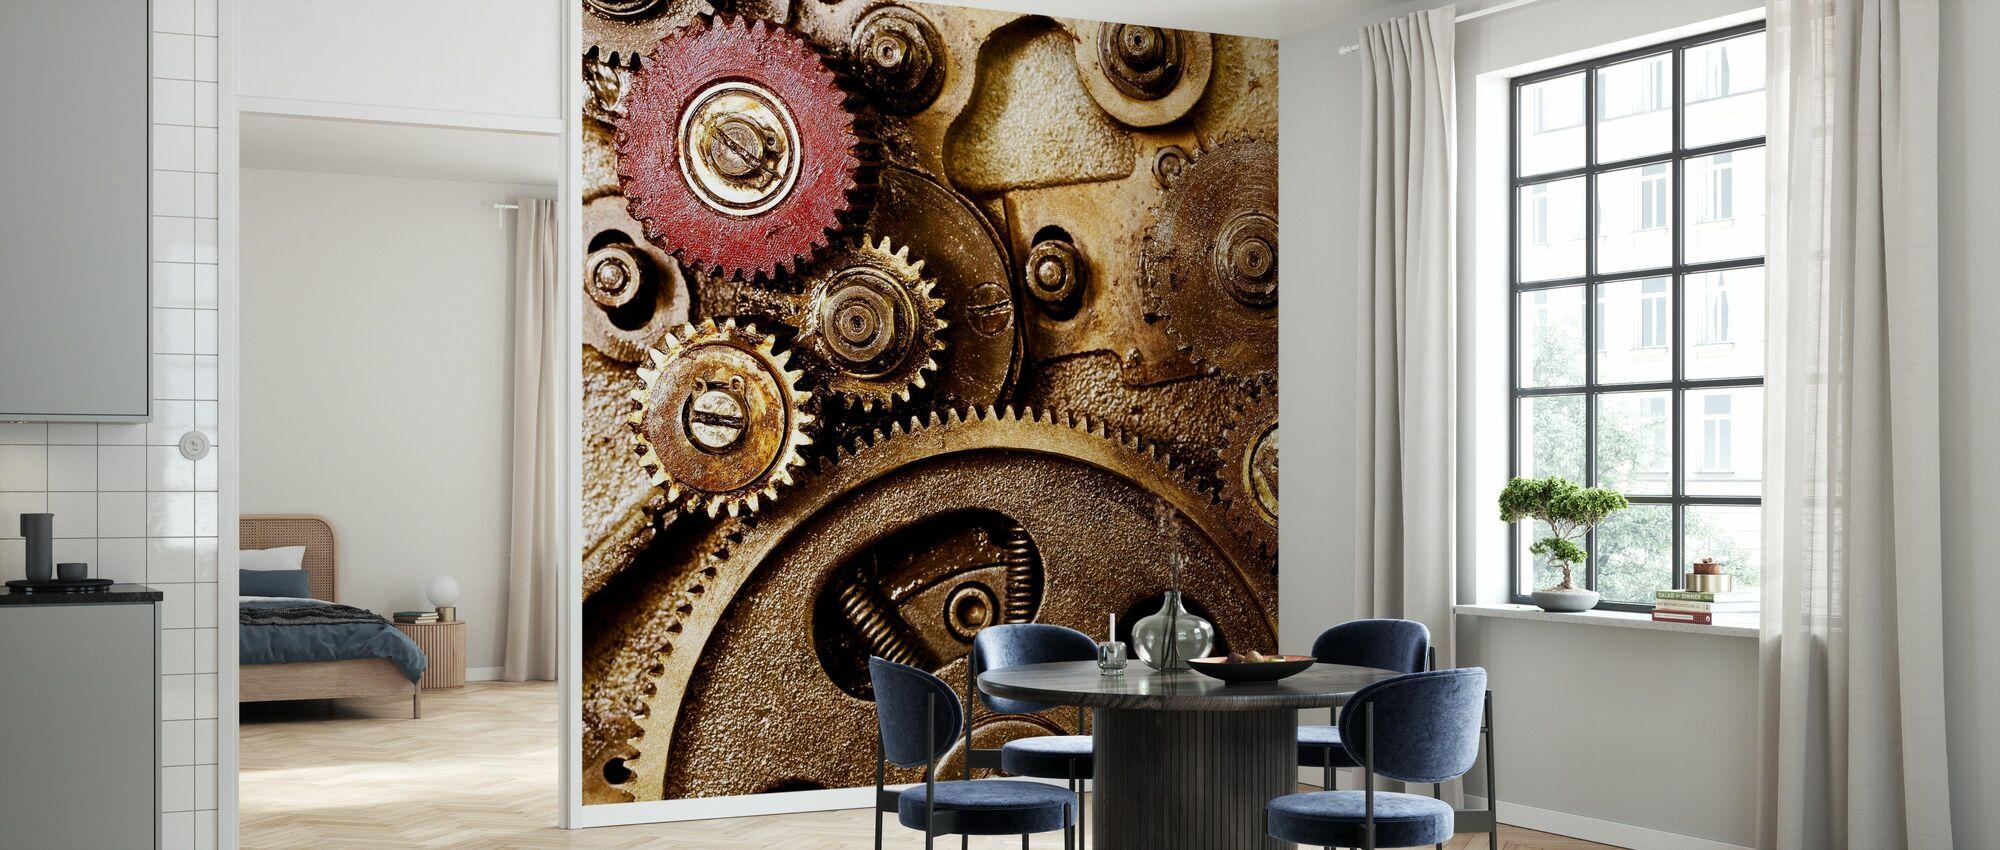 Vintage Gearing - Wallpaper - Kitchen